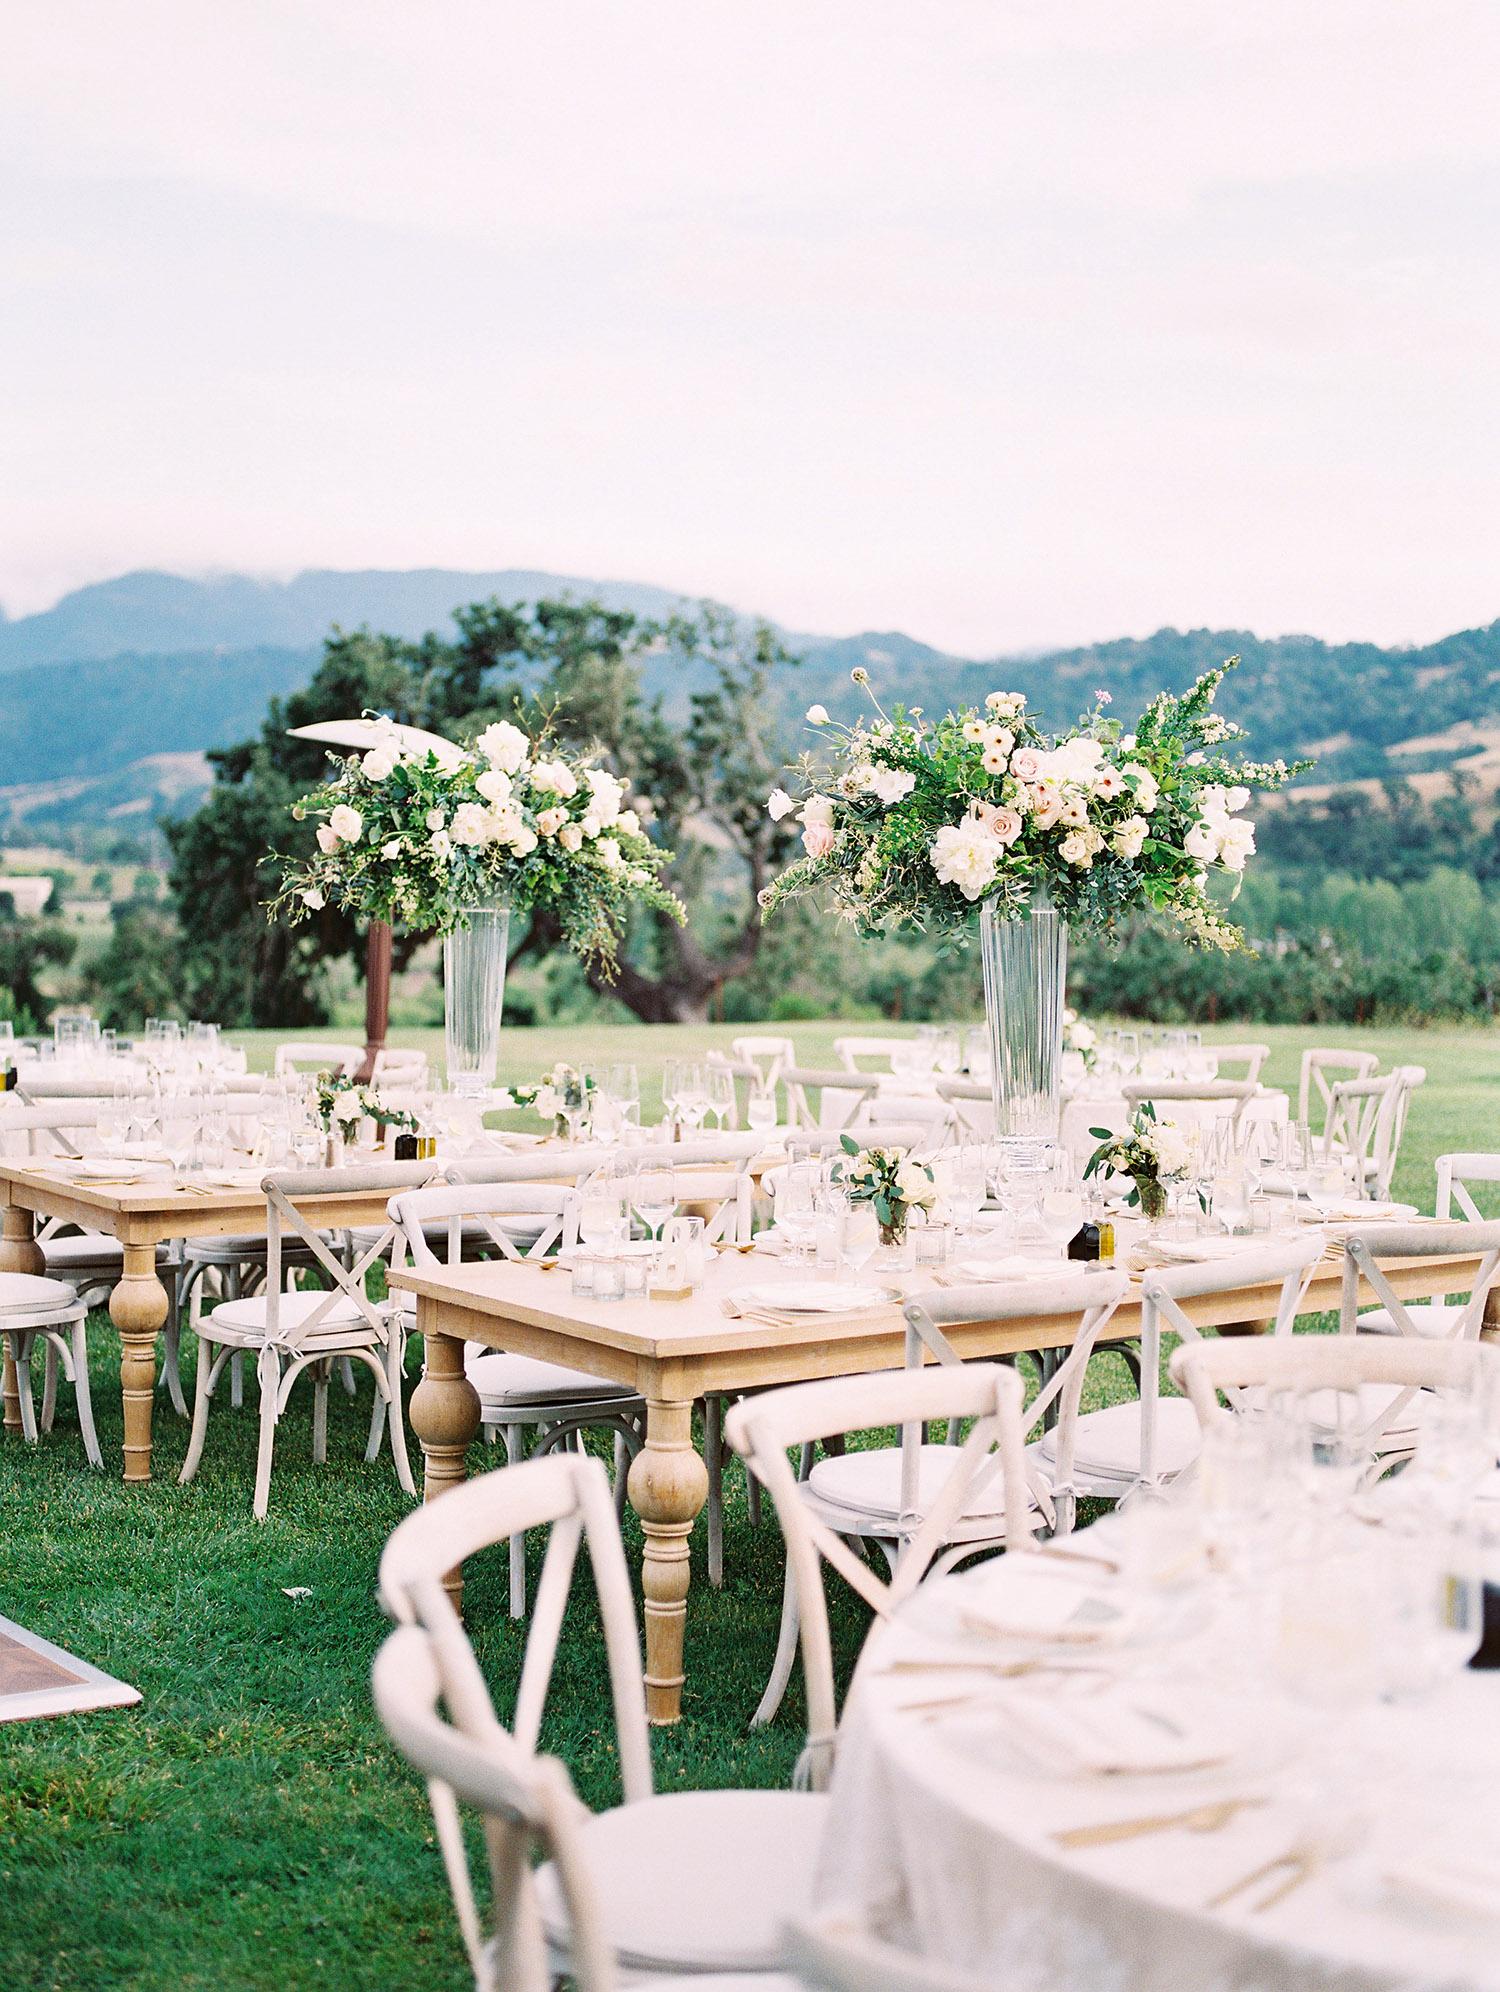 kati erik wedding reception tables